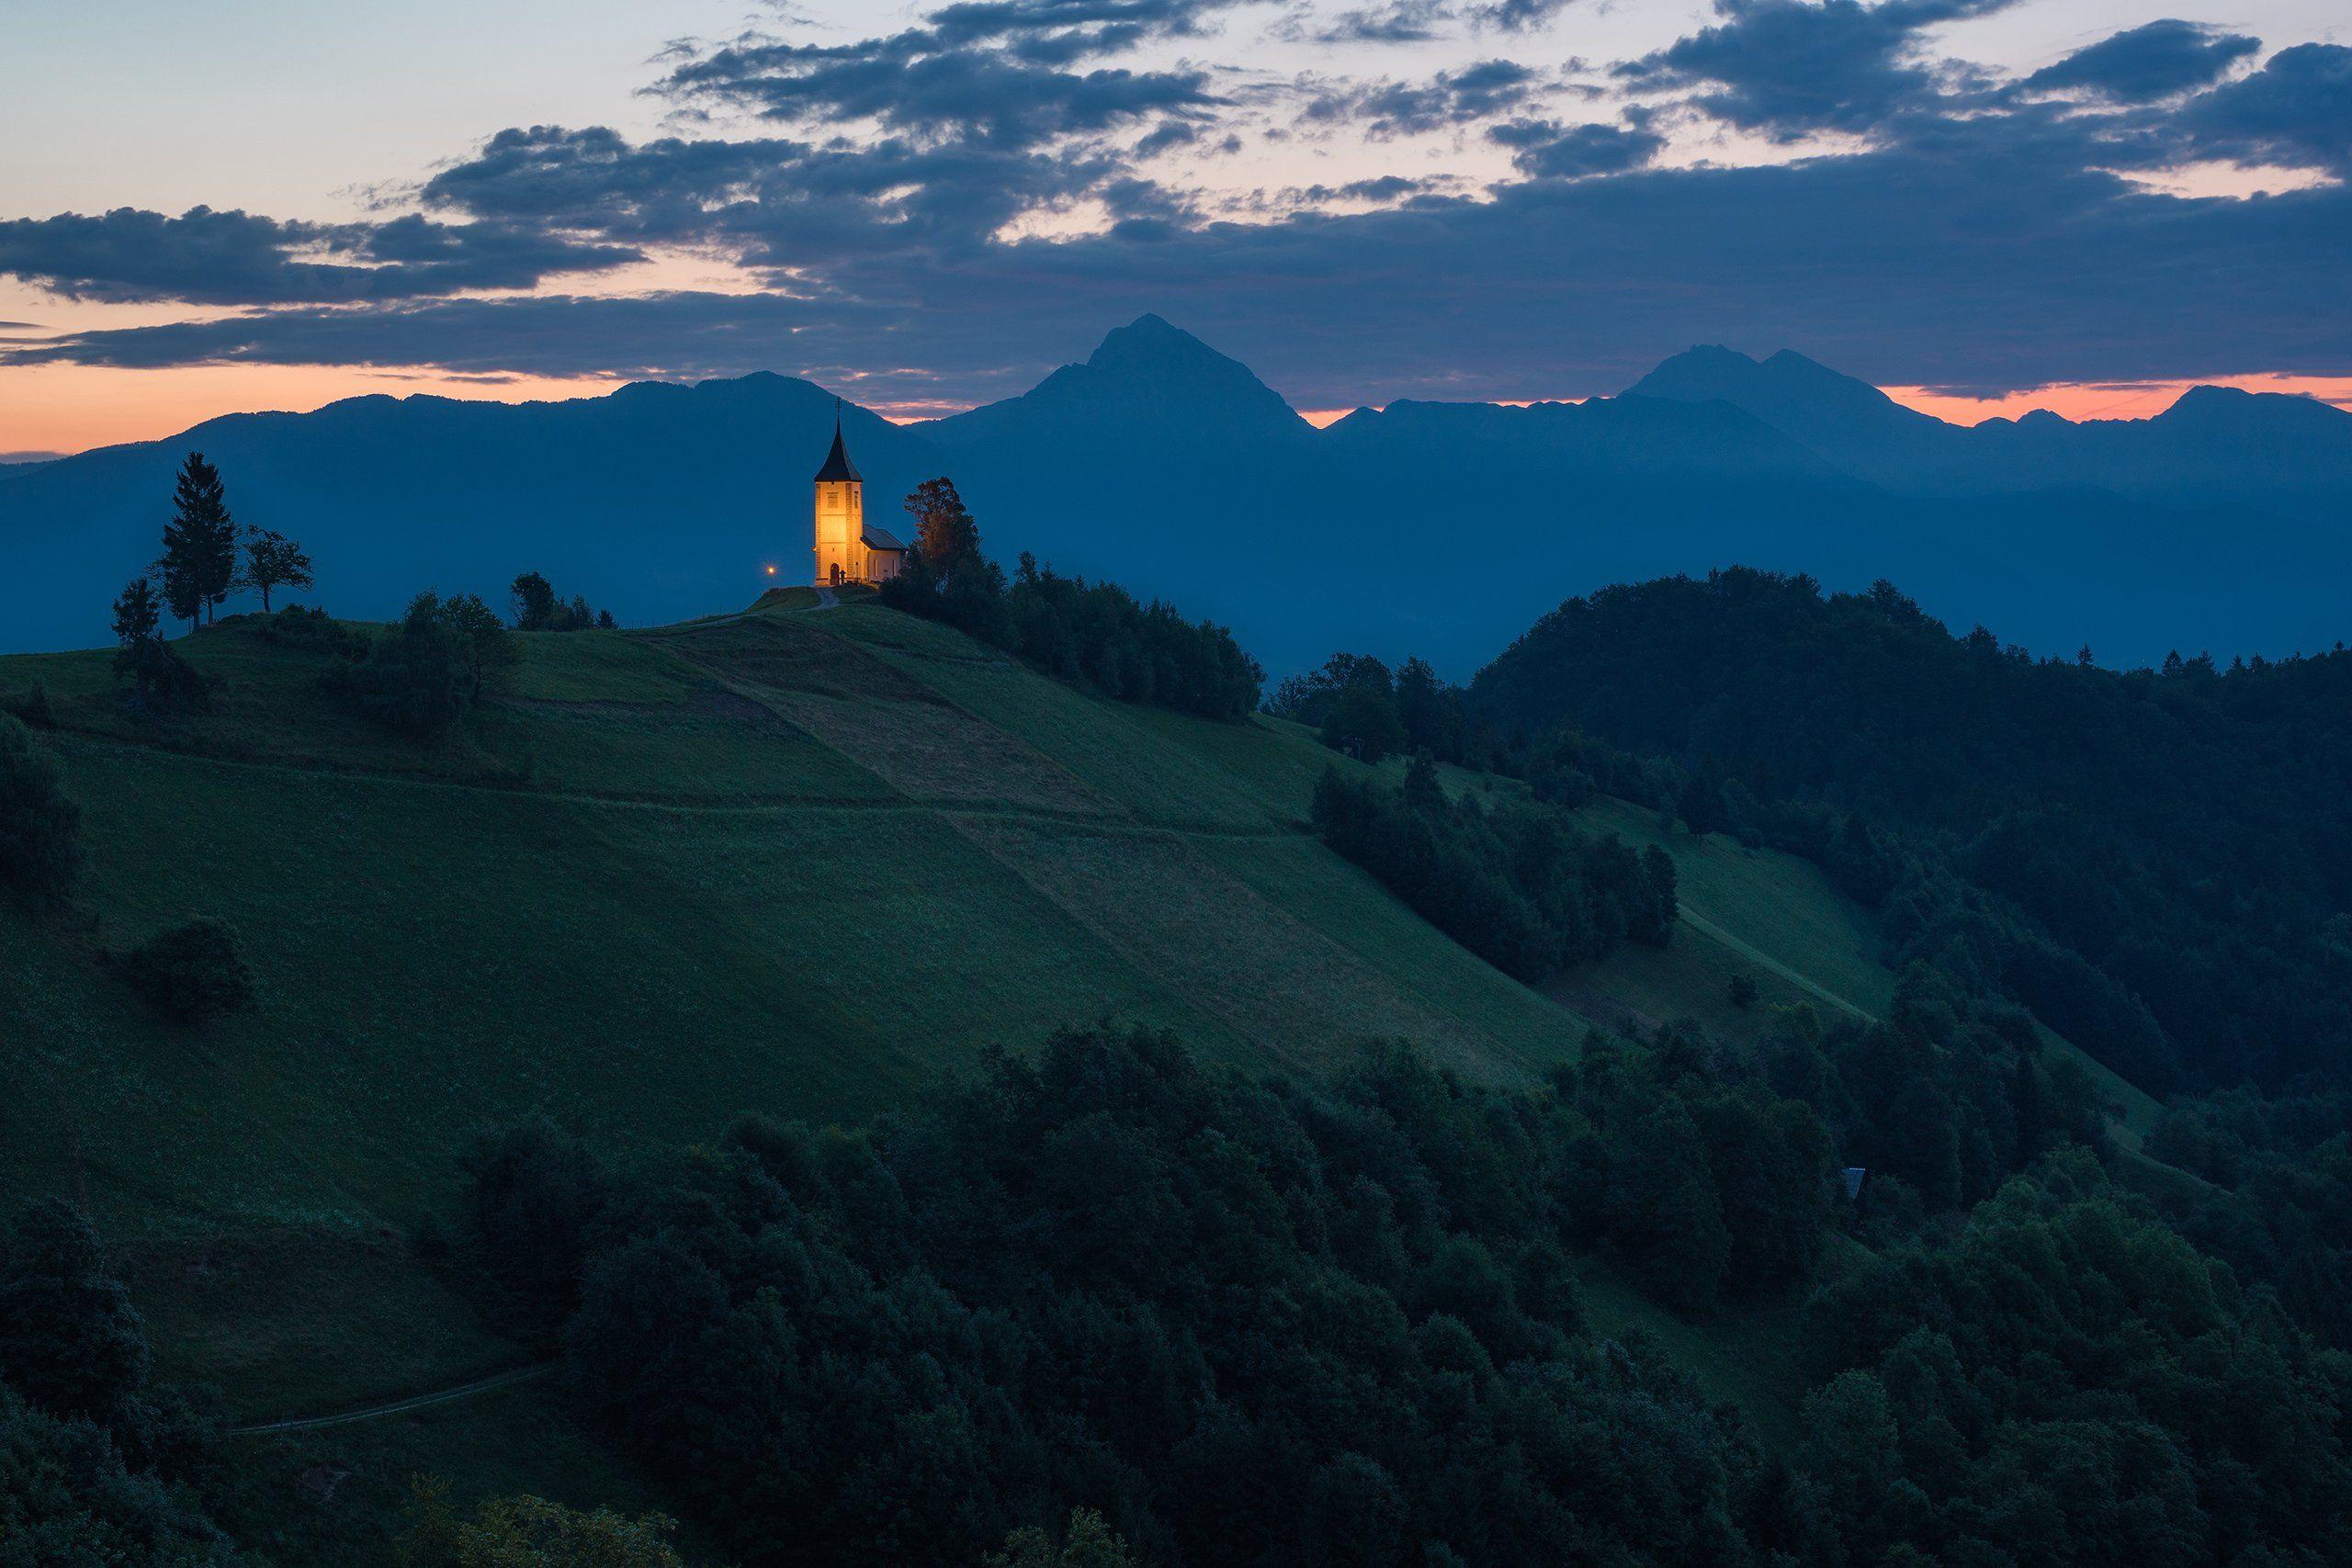 travel, landscape, morning, dawn, church, mountains, hill, путешествие, пейзаж, утро, рассвет, церковь, горы, холм, Сергей Серушкин